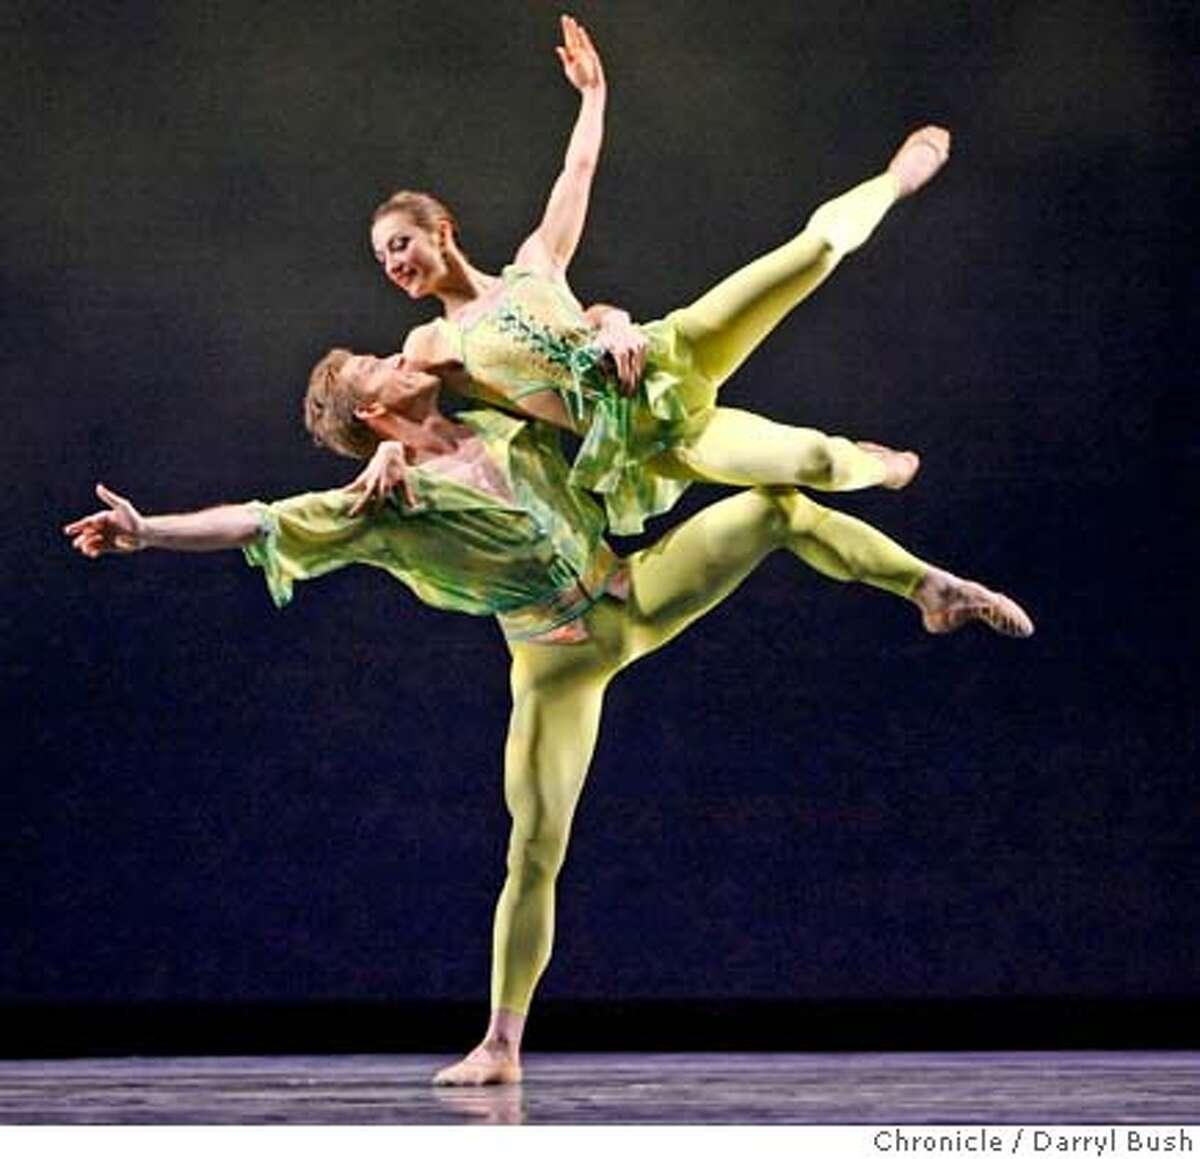 sfballet_0006_db.JPG Steven Norman and Pauli Magierek dance in